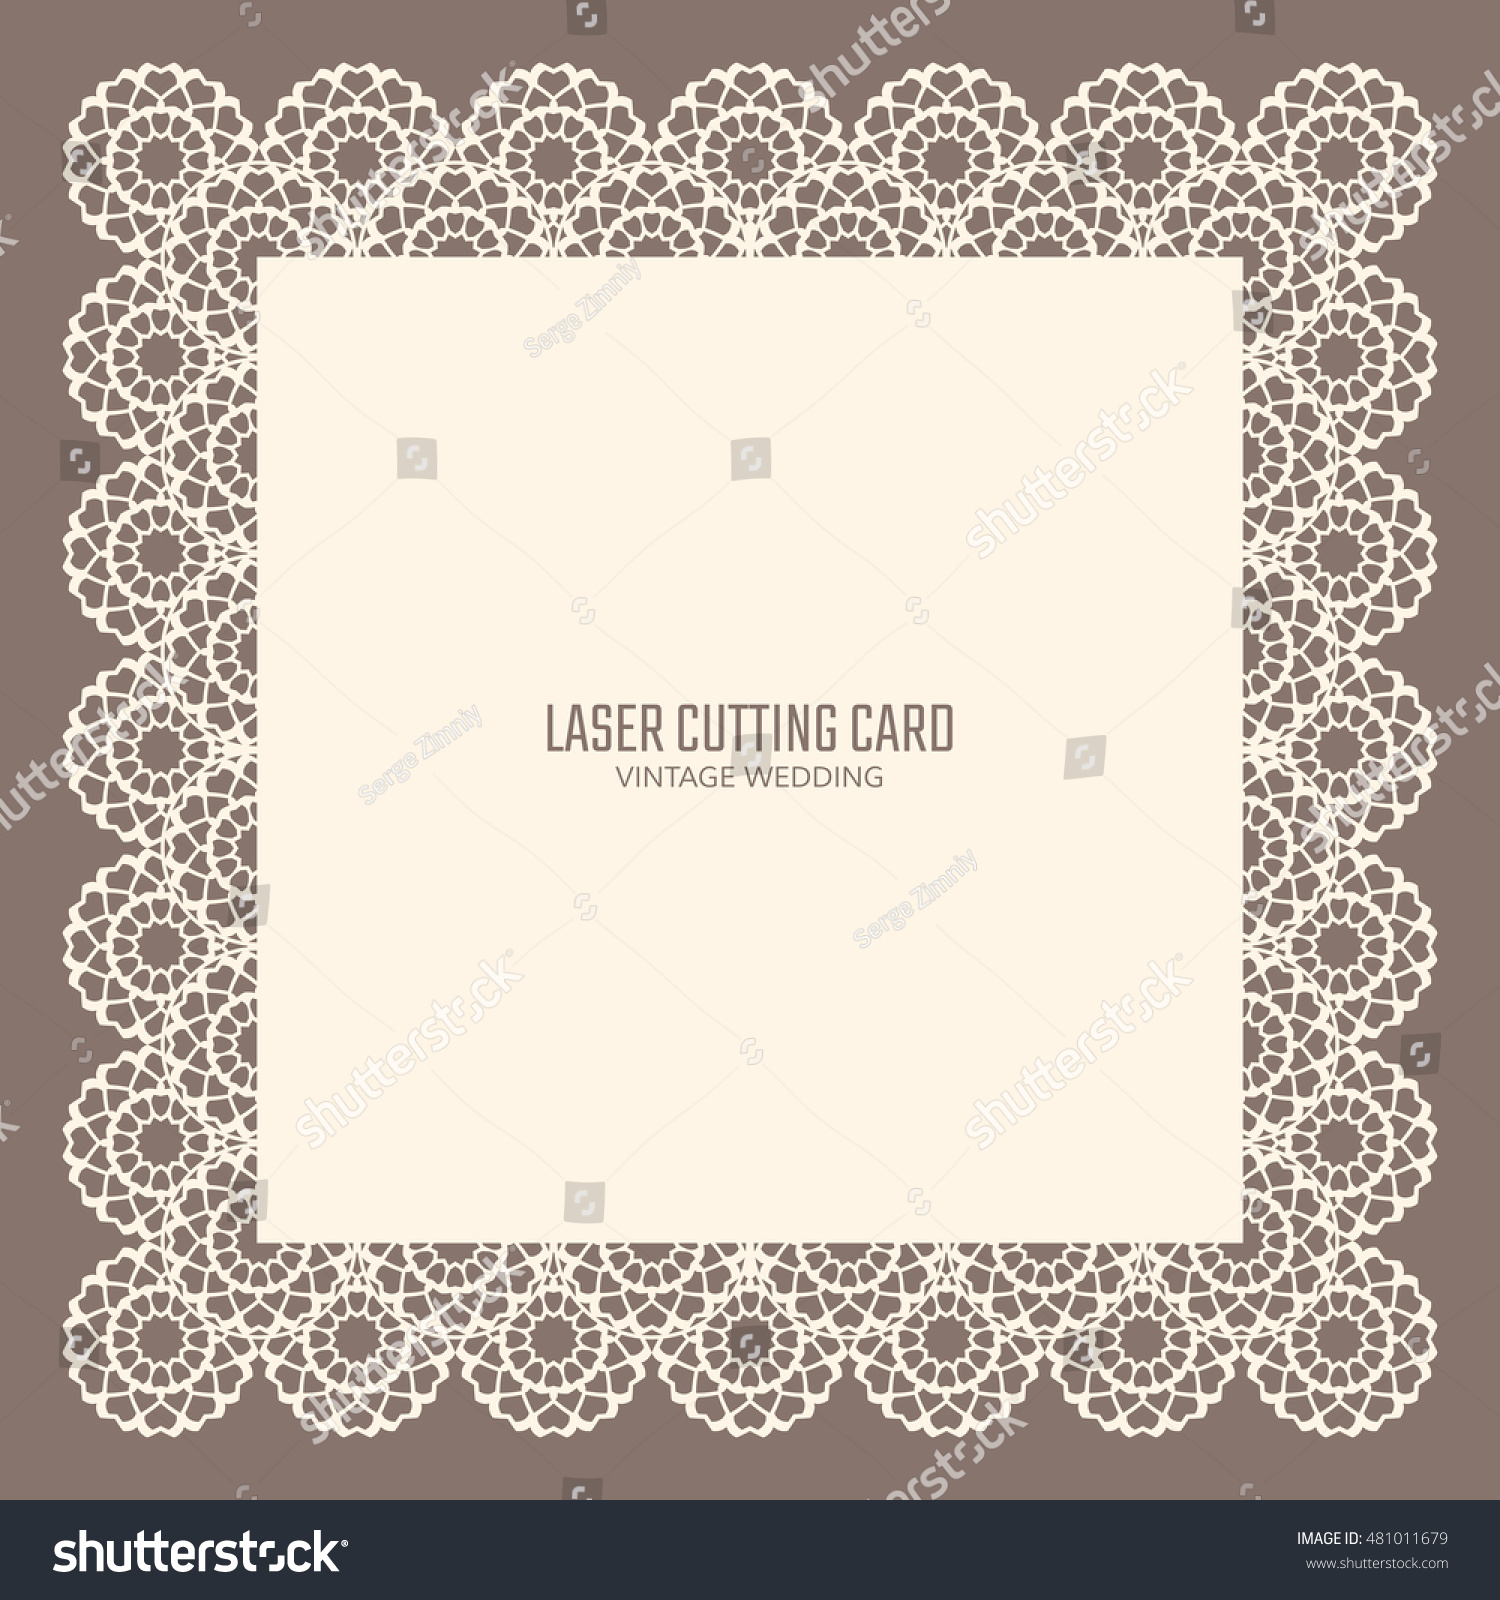 DIY Laser Cutting Vector Card Wedding Stock Vector (Royalty Free ...